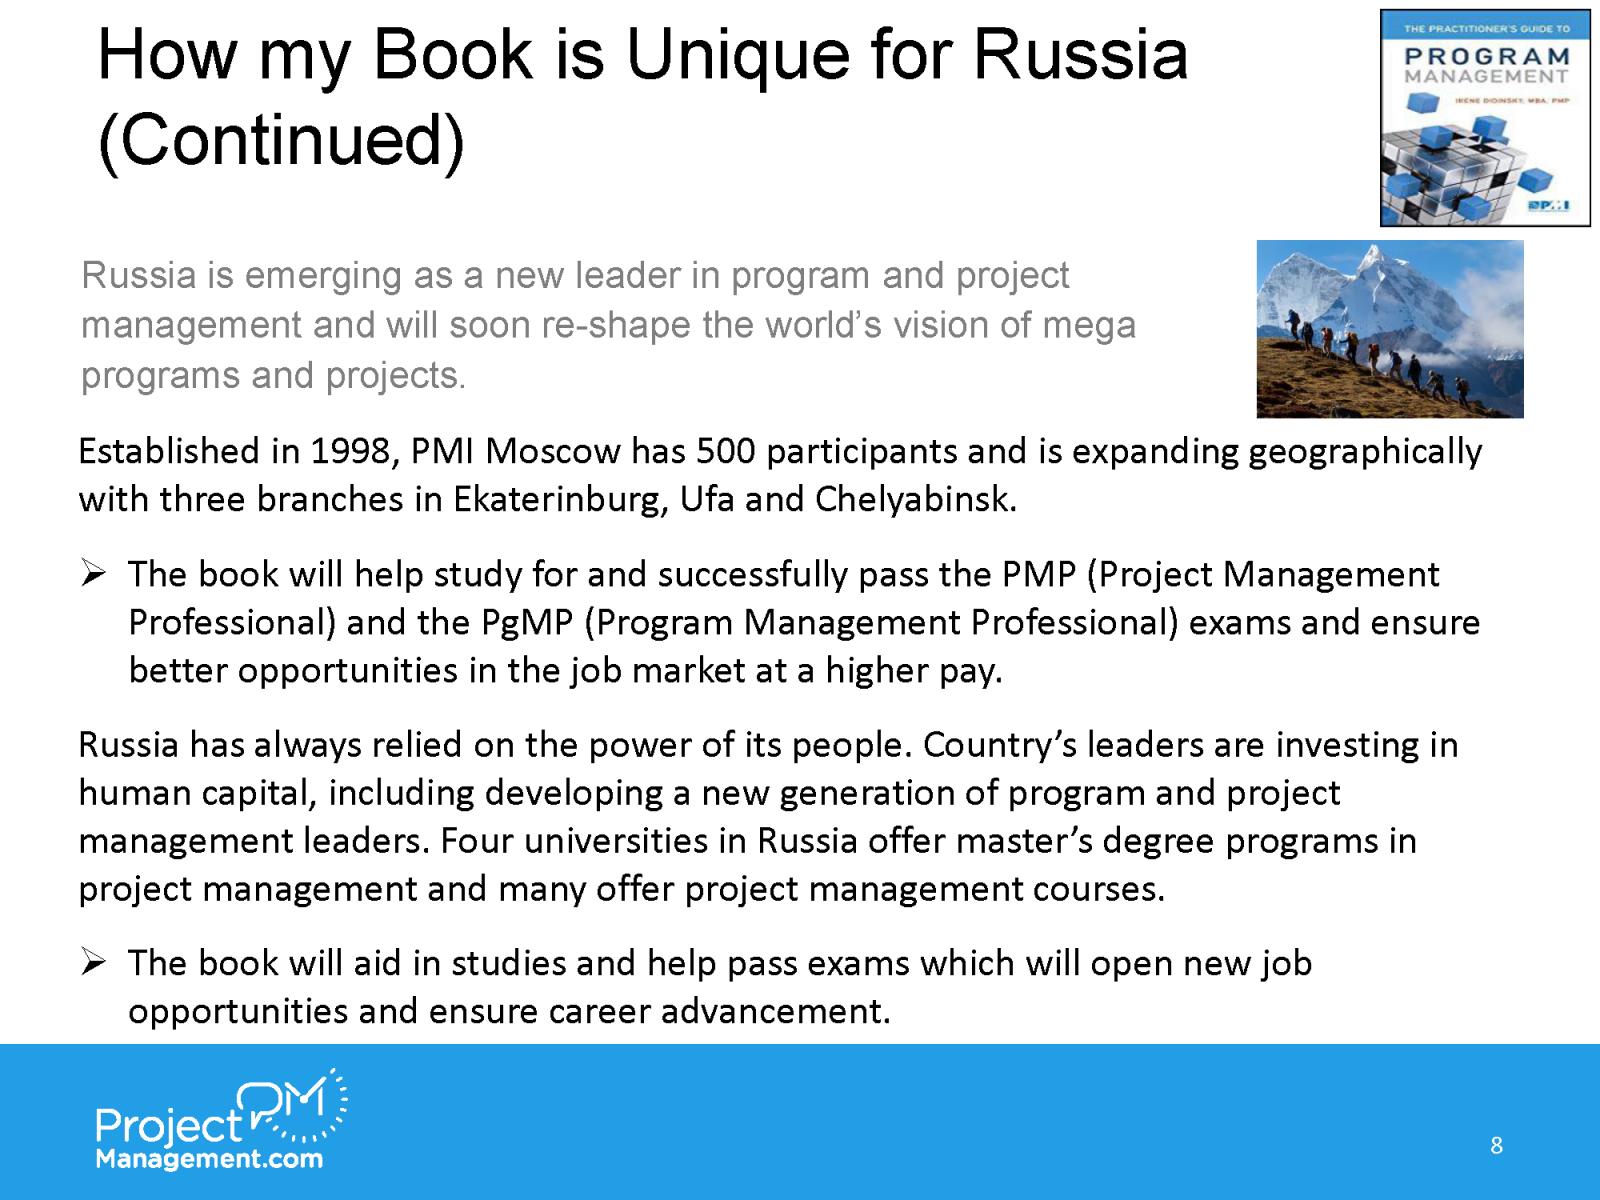 ProjectManagementcom webinar_Irene Didinsky_05112018_FinalFinal_Page_08